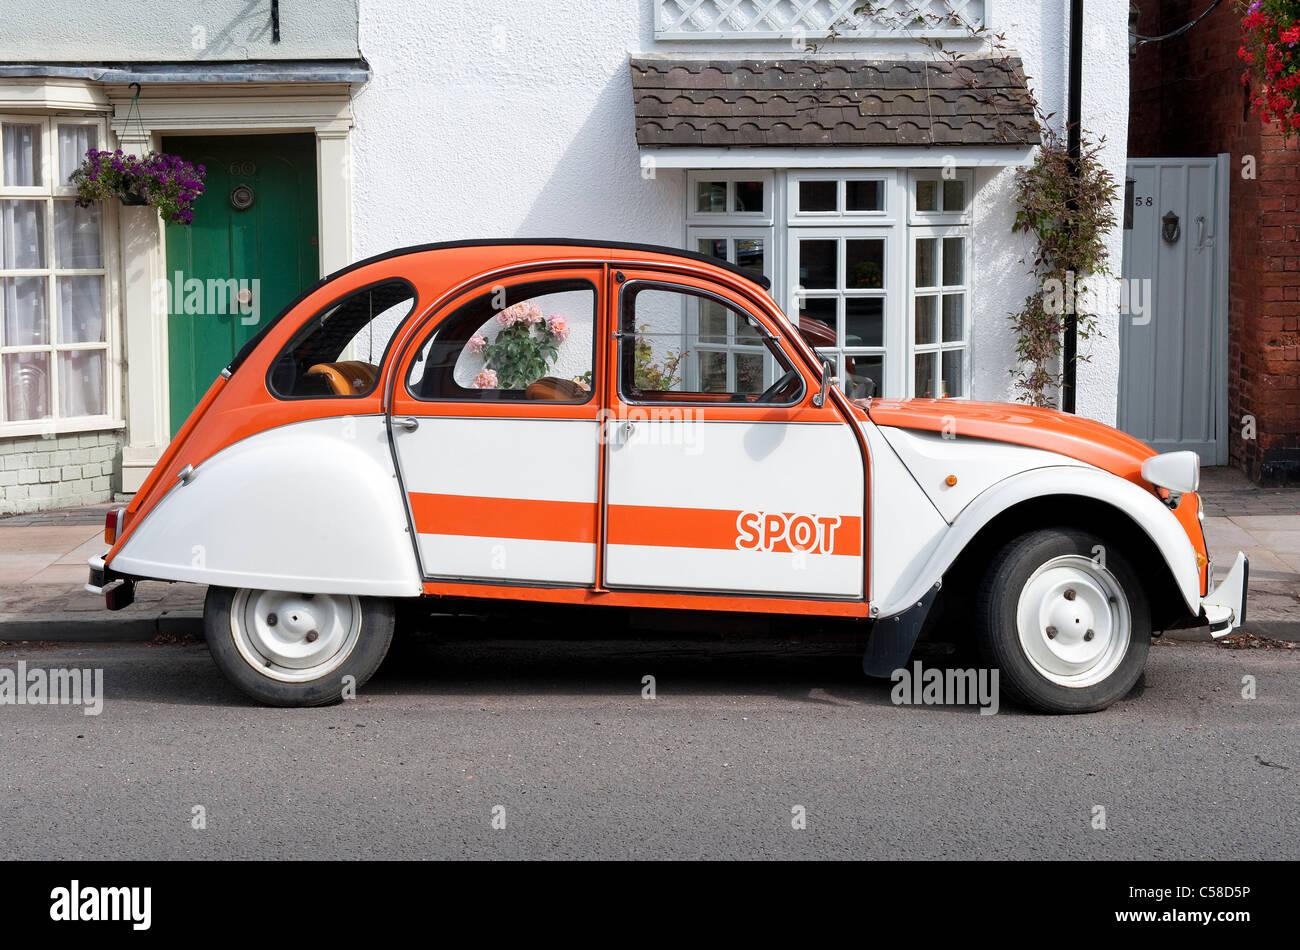 citroen 2cv french iconic retro style car Stock Photo: 37679986 - Alamy